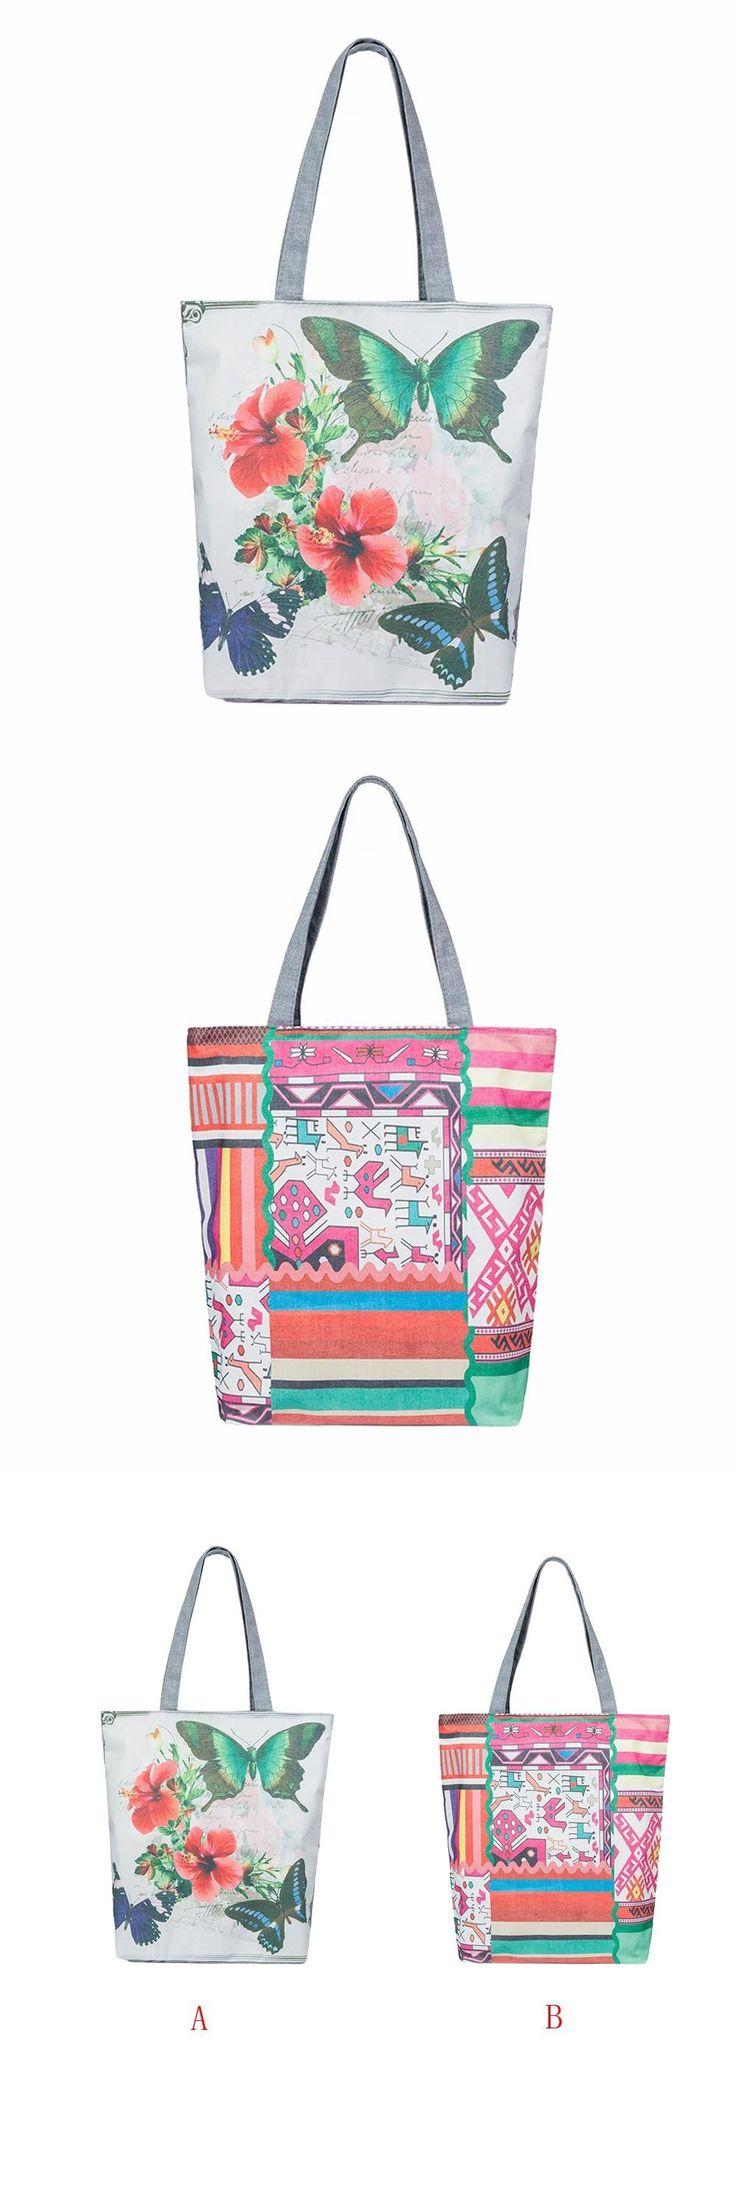 [Visit to Buy] Printing Canvas Tote Casual Beach Bags Women Shopping Bag Handbags luxury handbags women bags designer wholesale sale #75123 #Advertisement